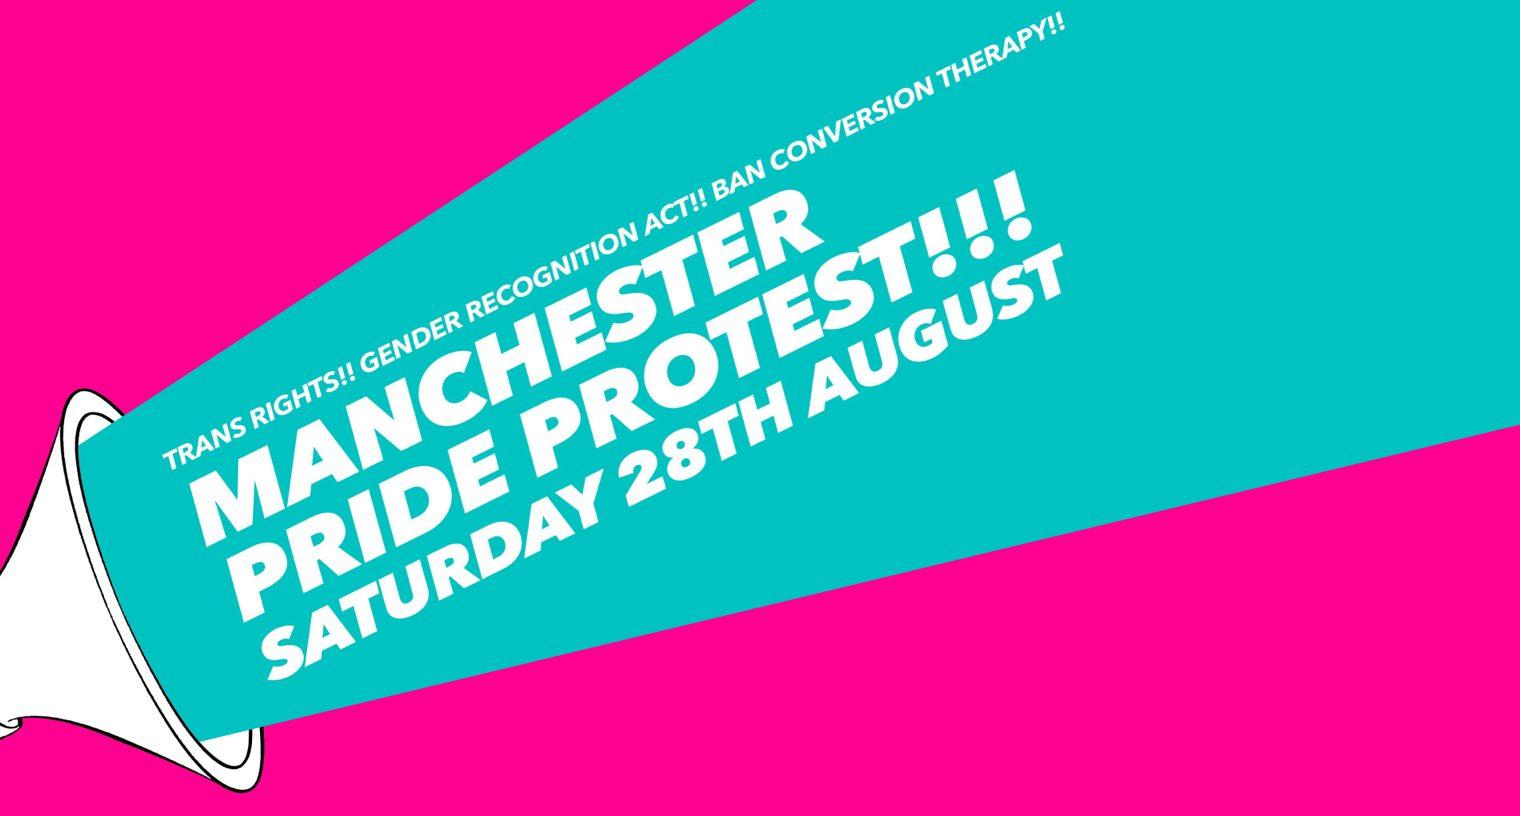 Manchester Pride Protest